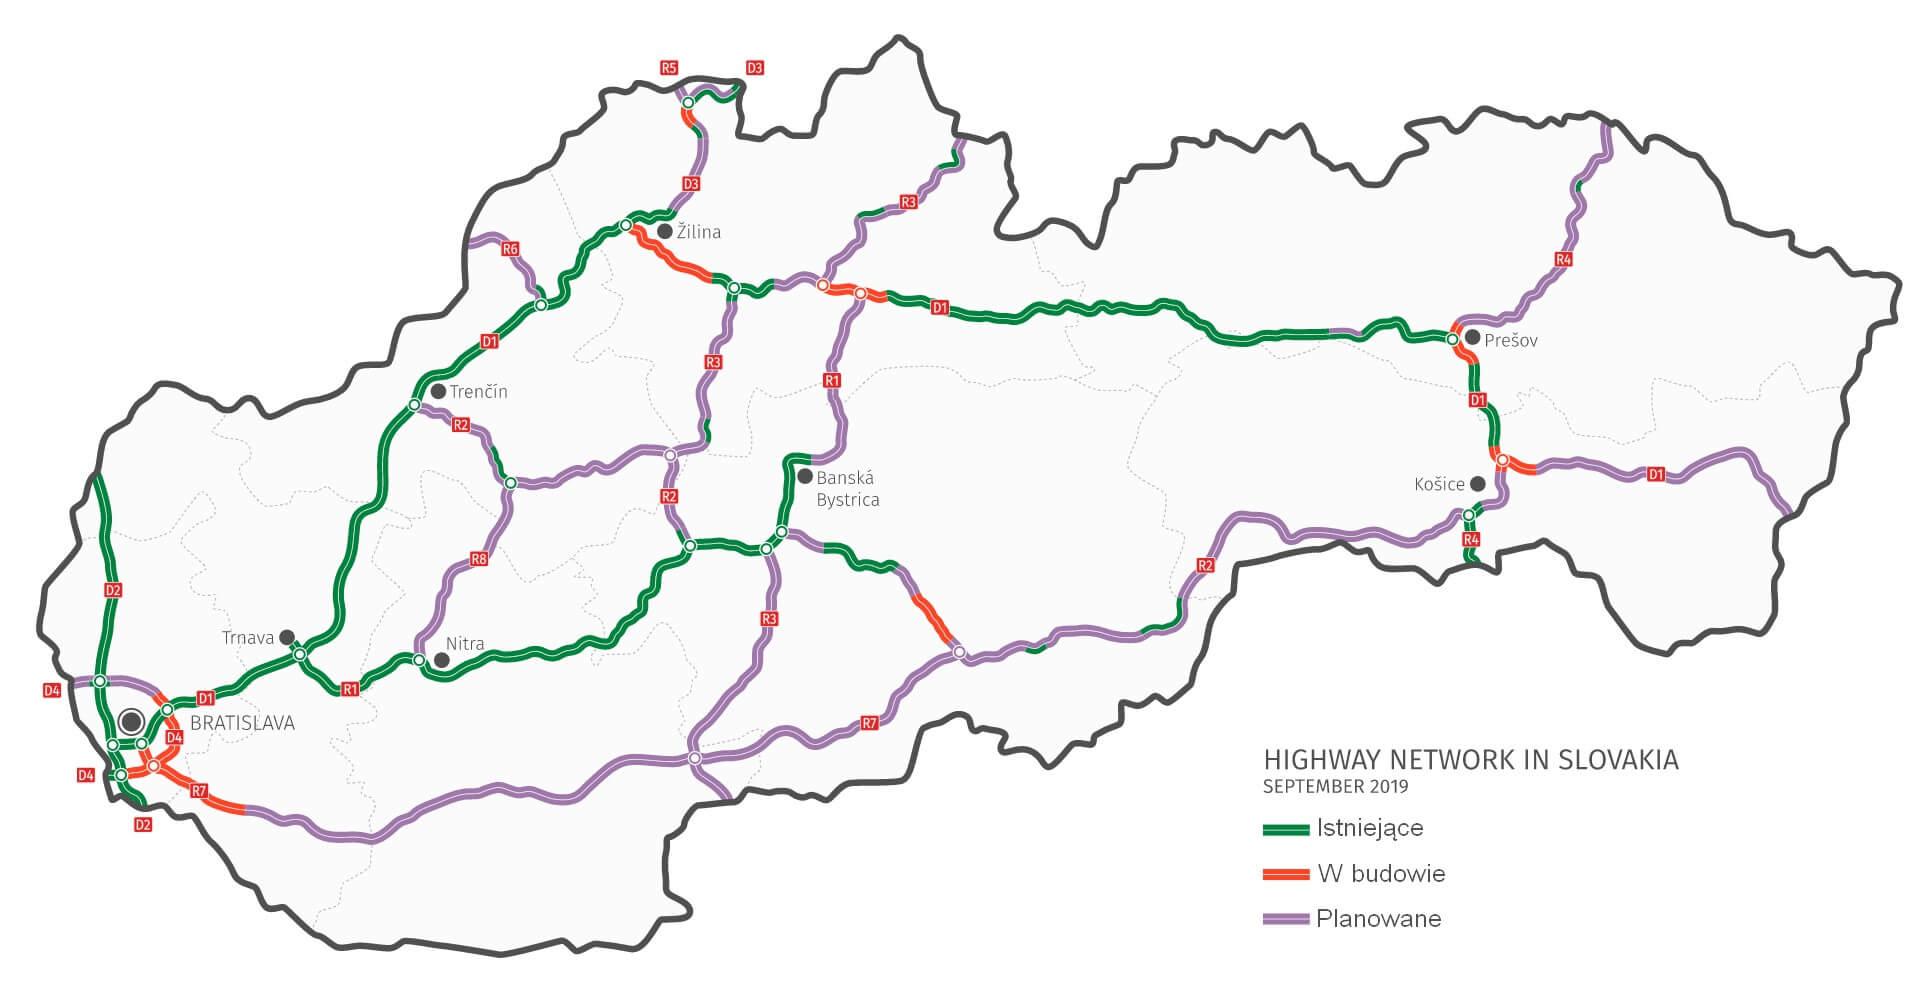 Mapa autostrad na Słowacji